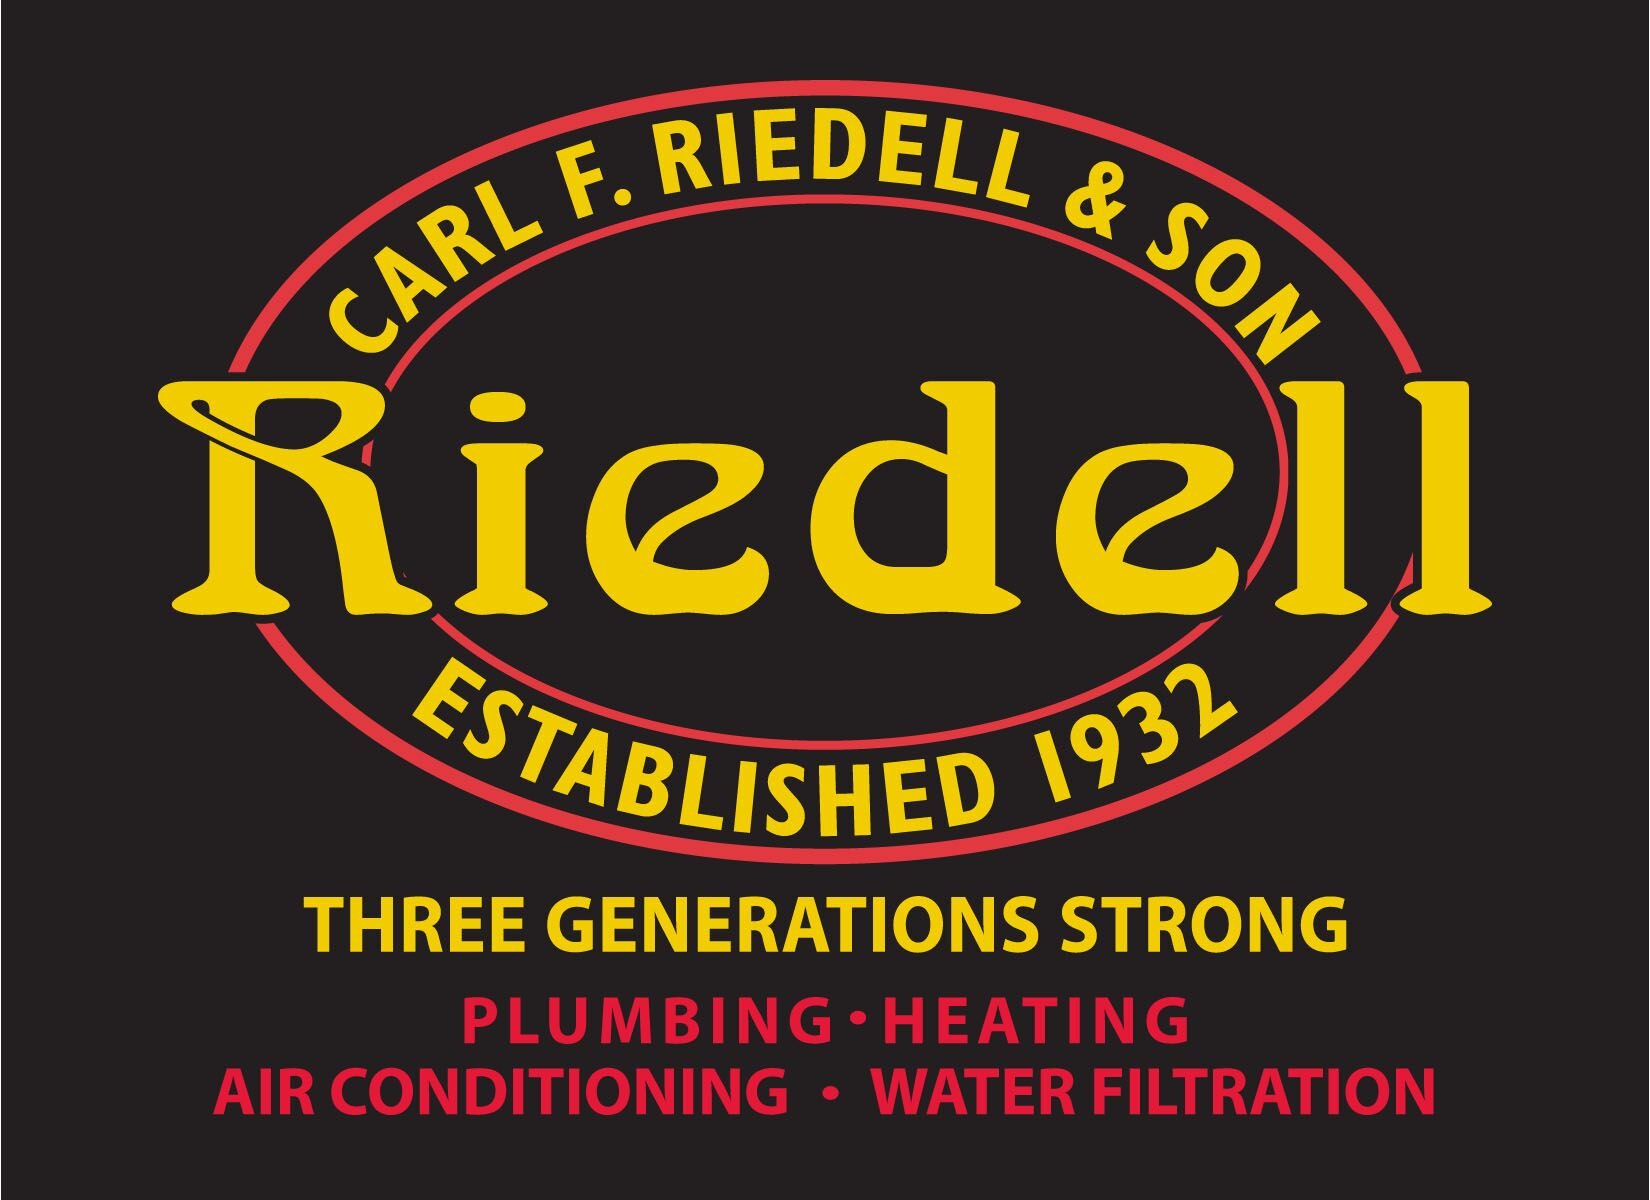 Carl F. Riedell & Son